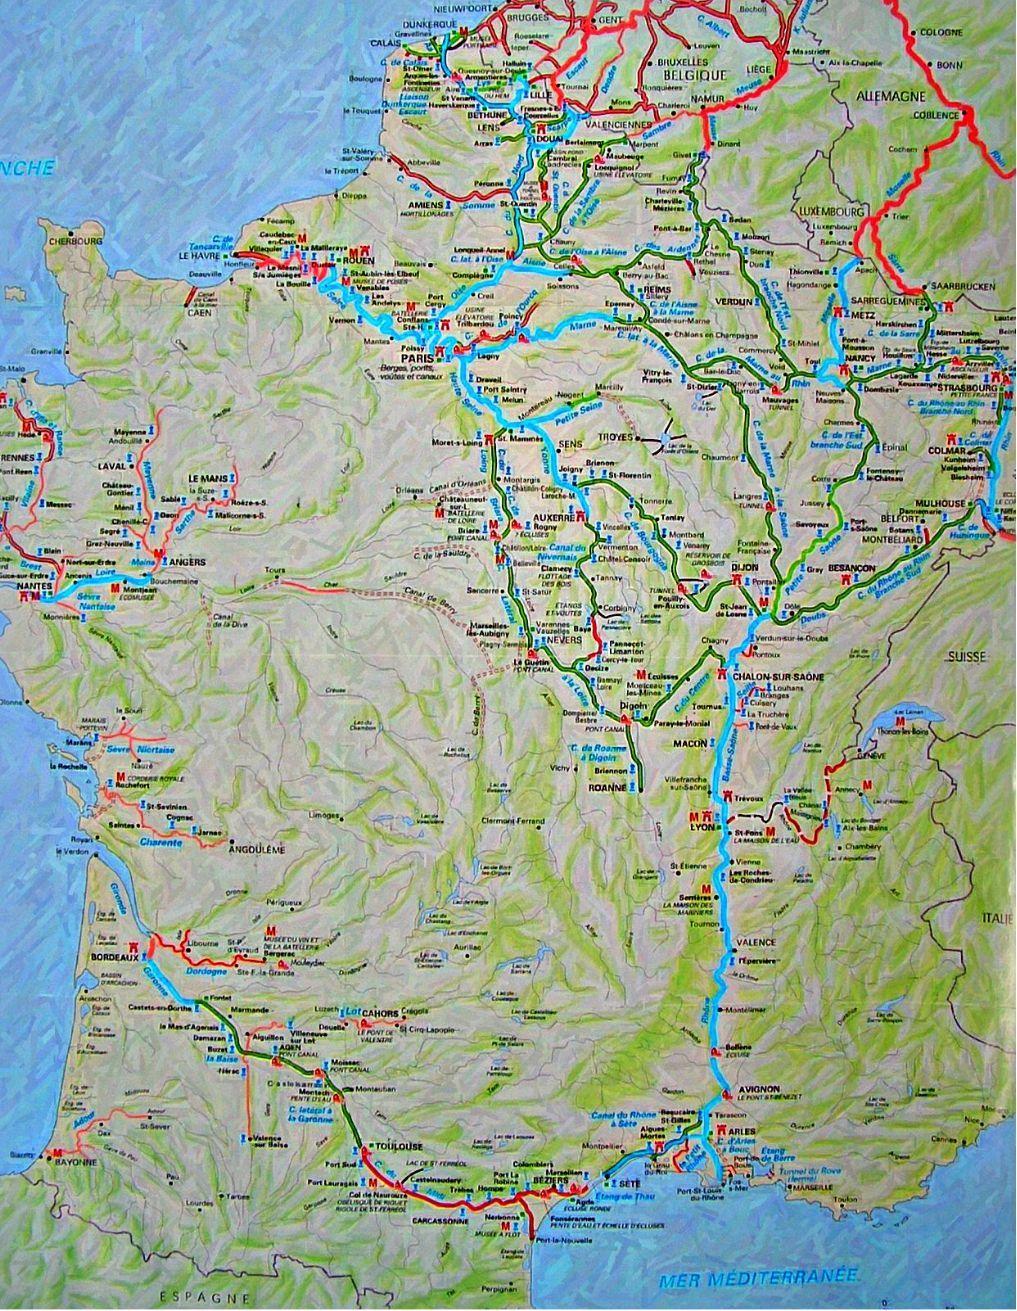 French Waterway Maps Contentedsouls - World waterways map